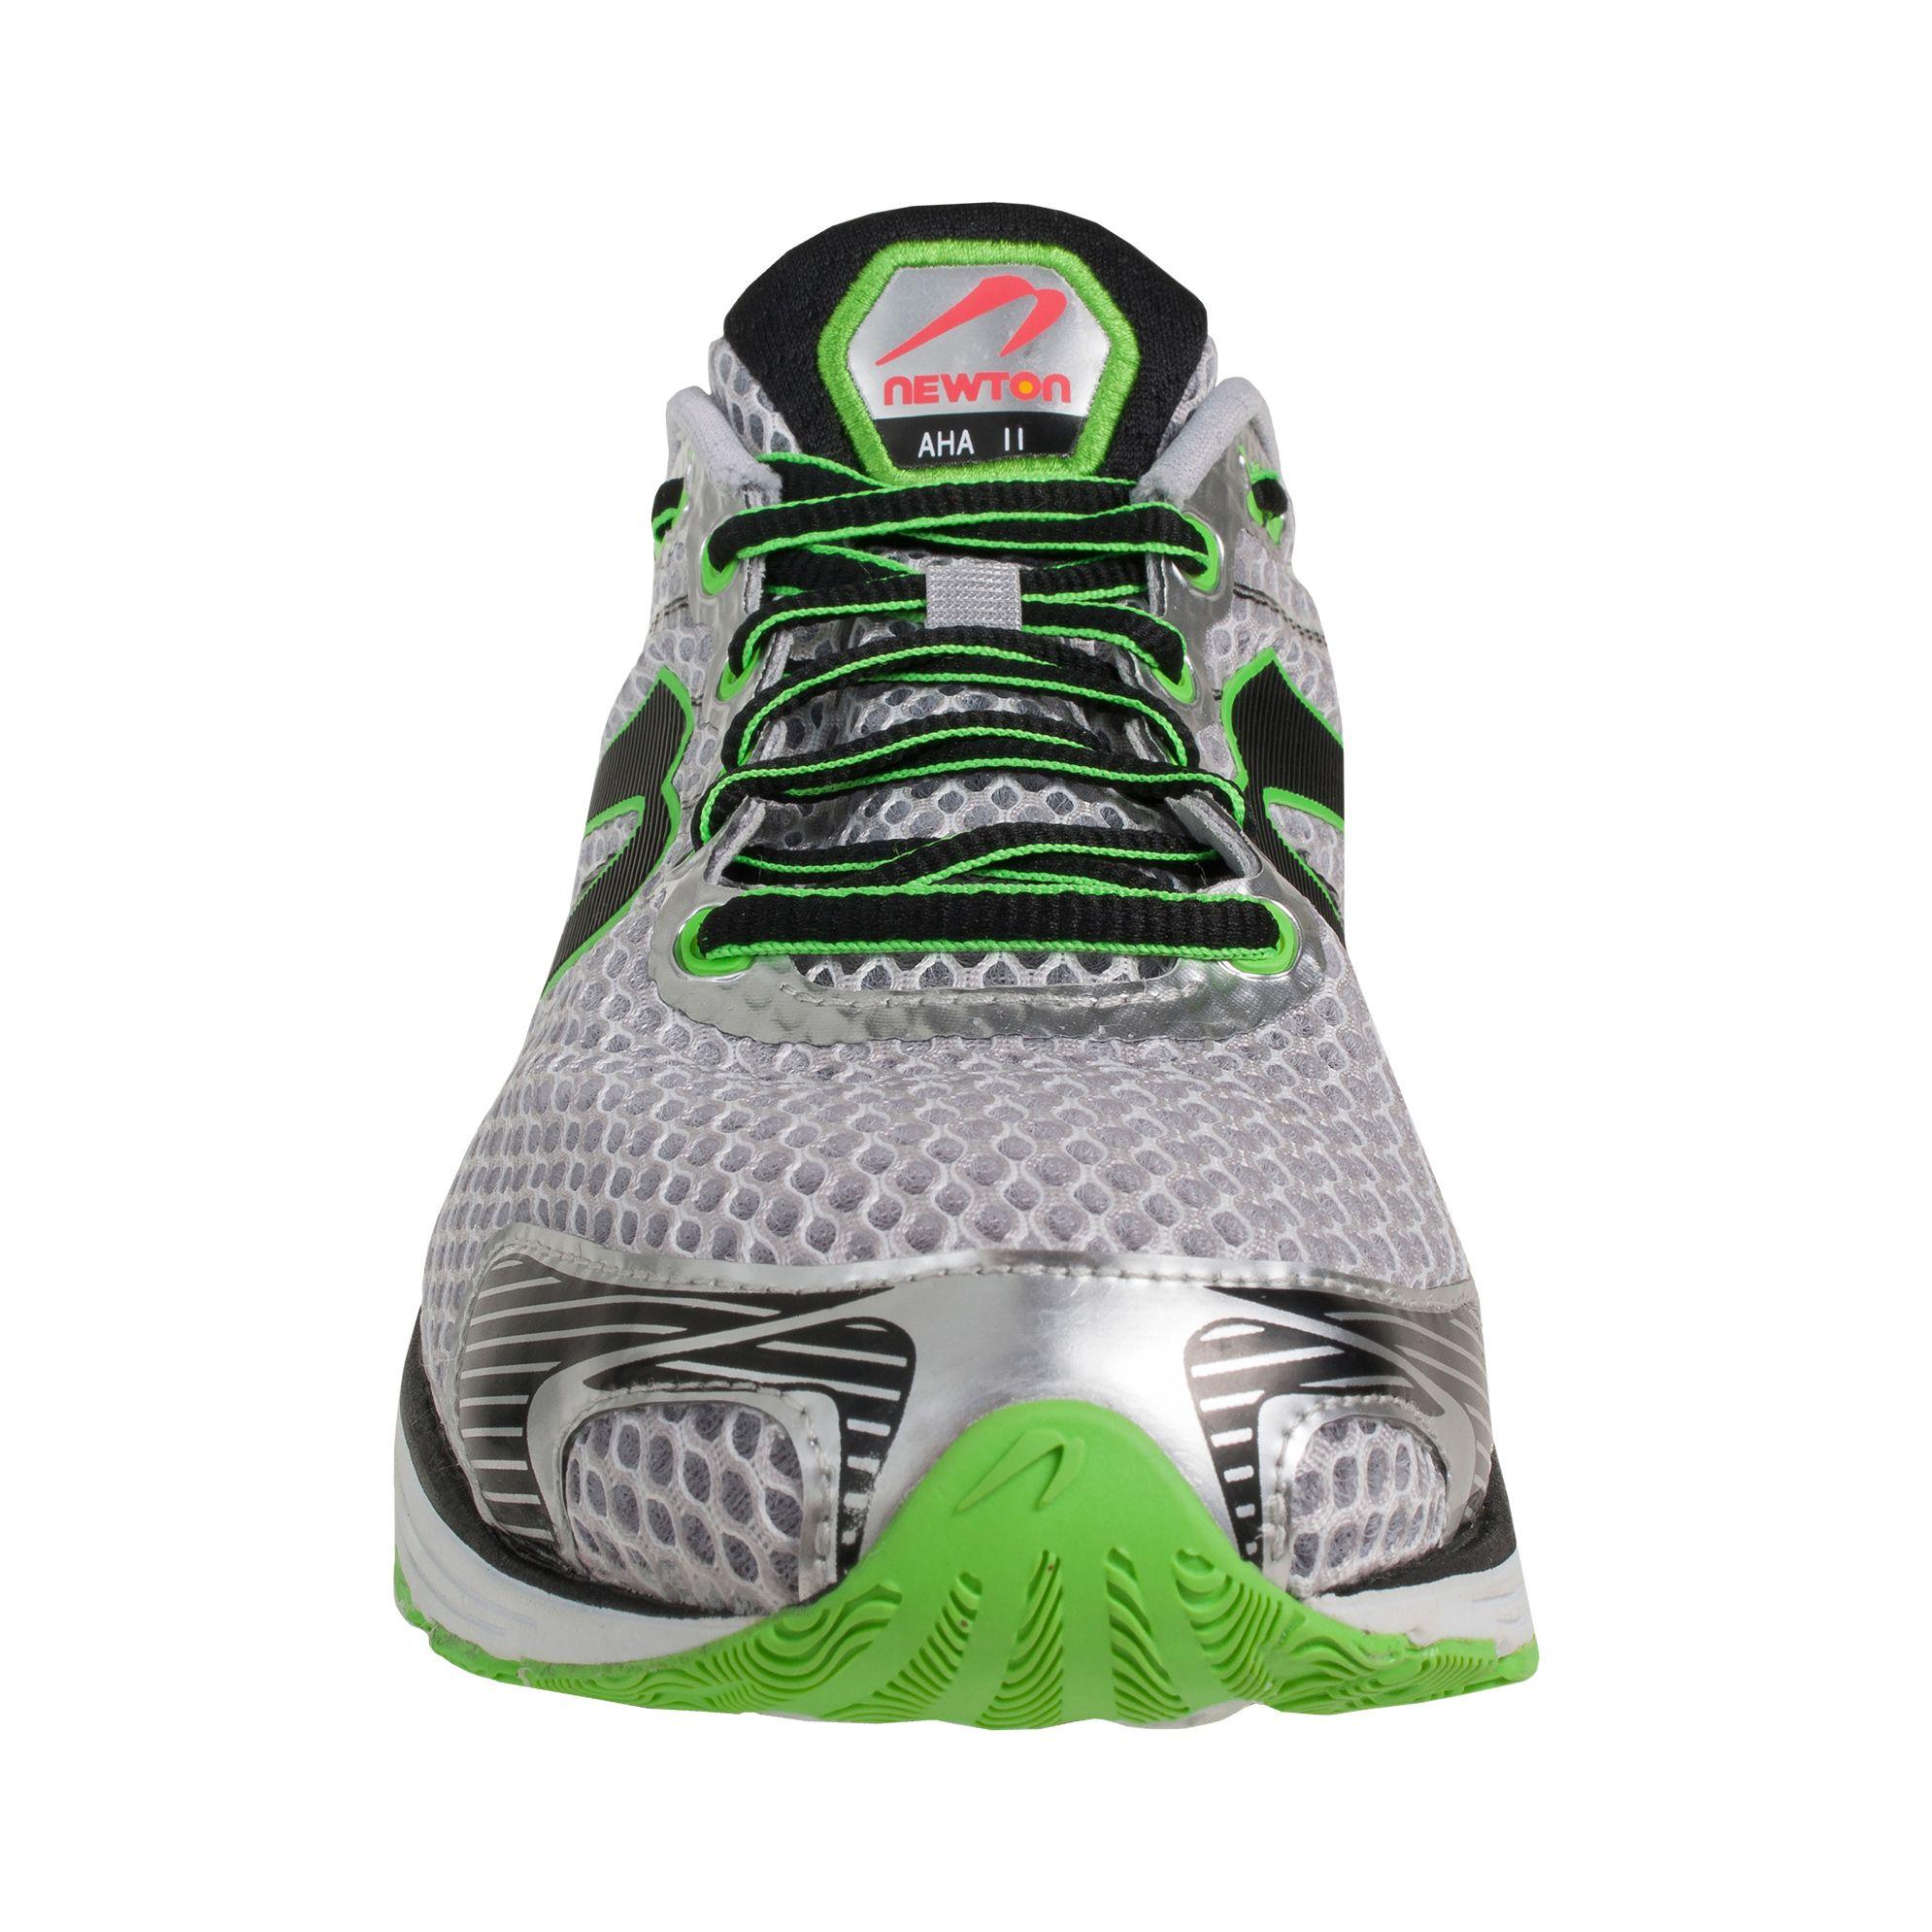 Vs Athletics Weightlifting Shoe Sale